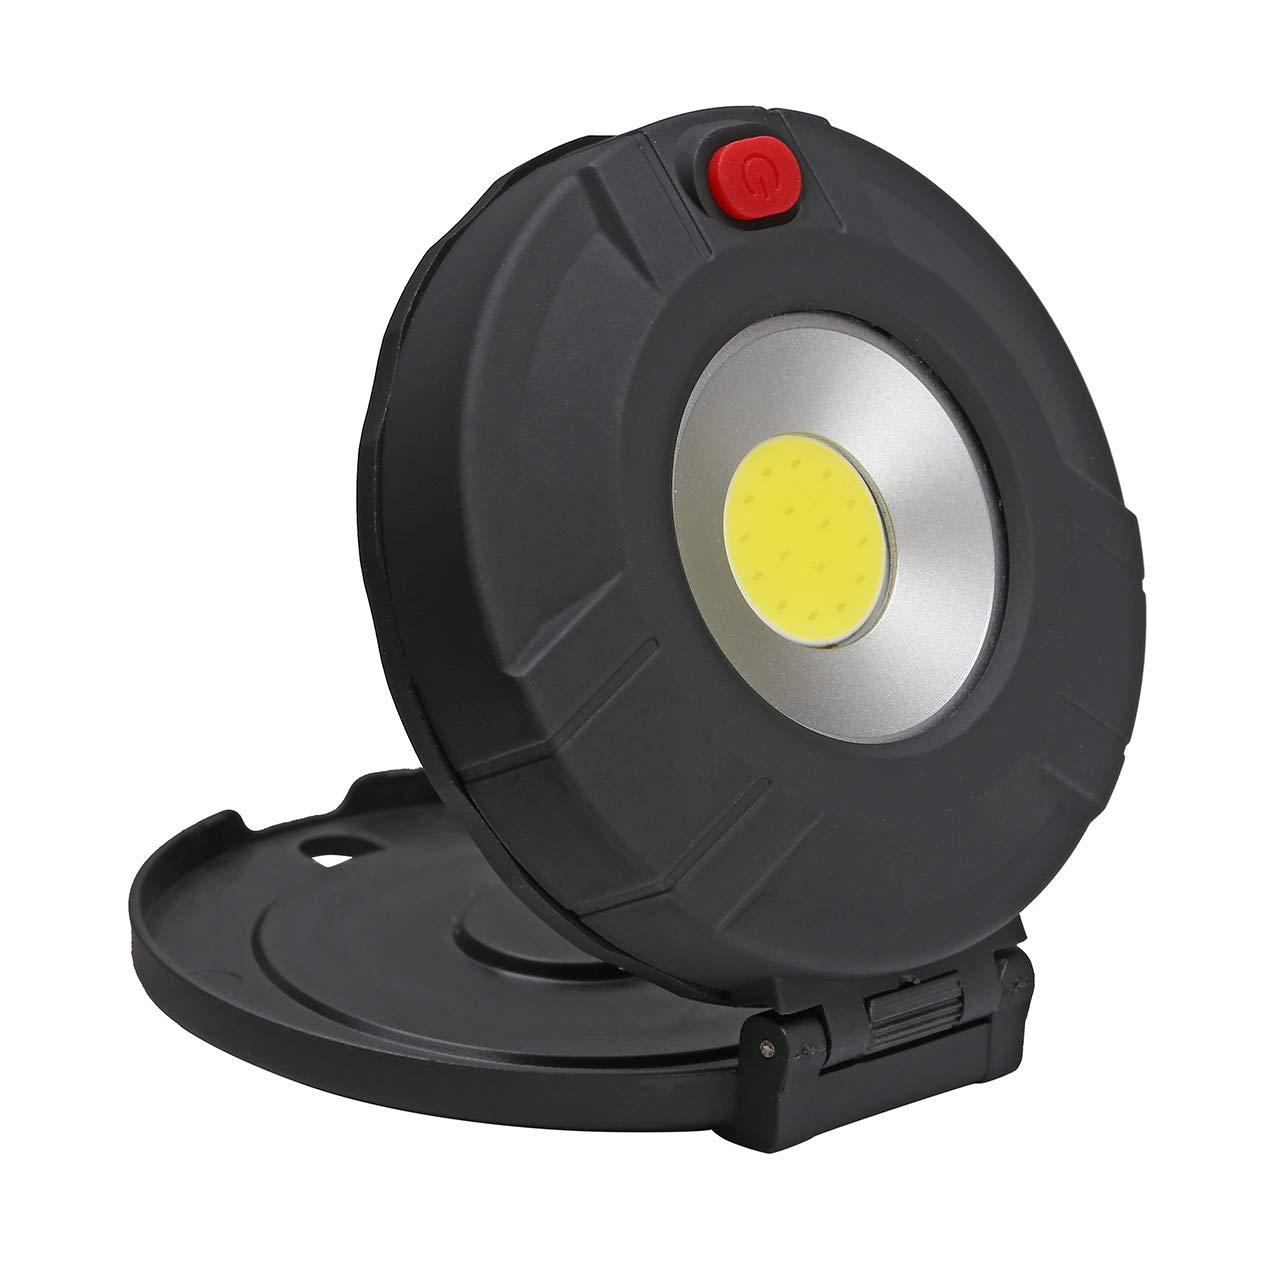 ACBungji Base Magnetica indicatore di Emergenza Luce Lampeggiante Giroscopio a LED per Auto